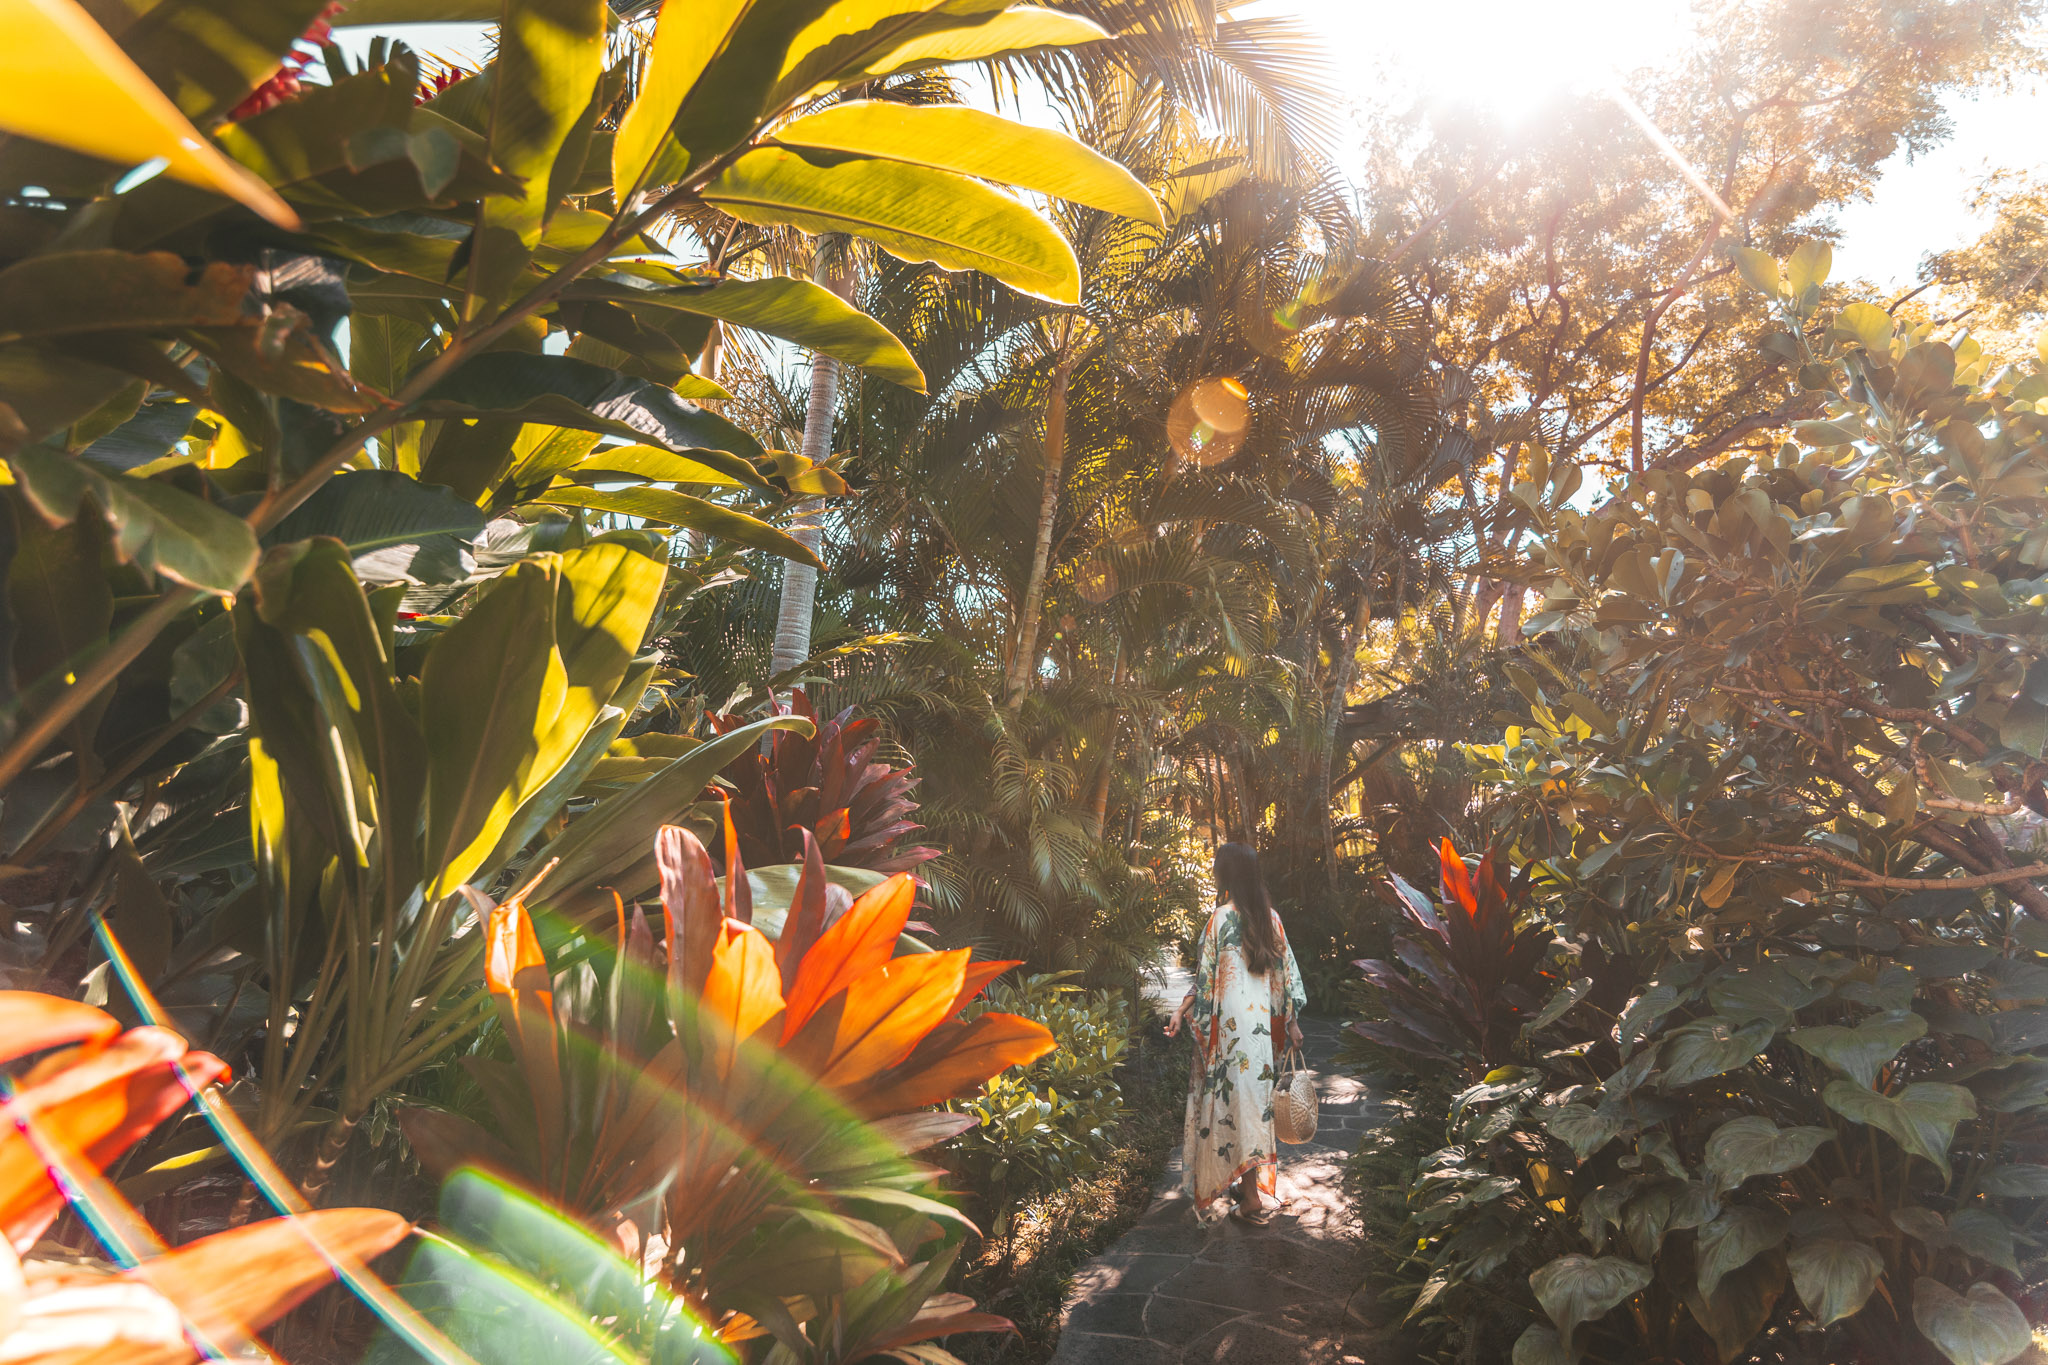 Hualalai spa // A Luxury Stay on the Big Island: Four Seasons Resort Hualalai // #readysetjetset #hawaii #bigisland #luxuryhotels #beachresorts #usa #travel